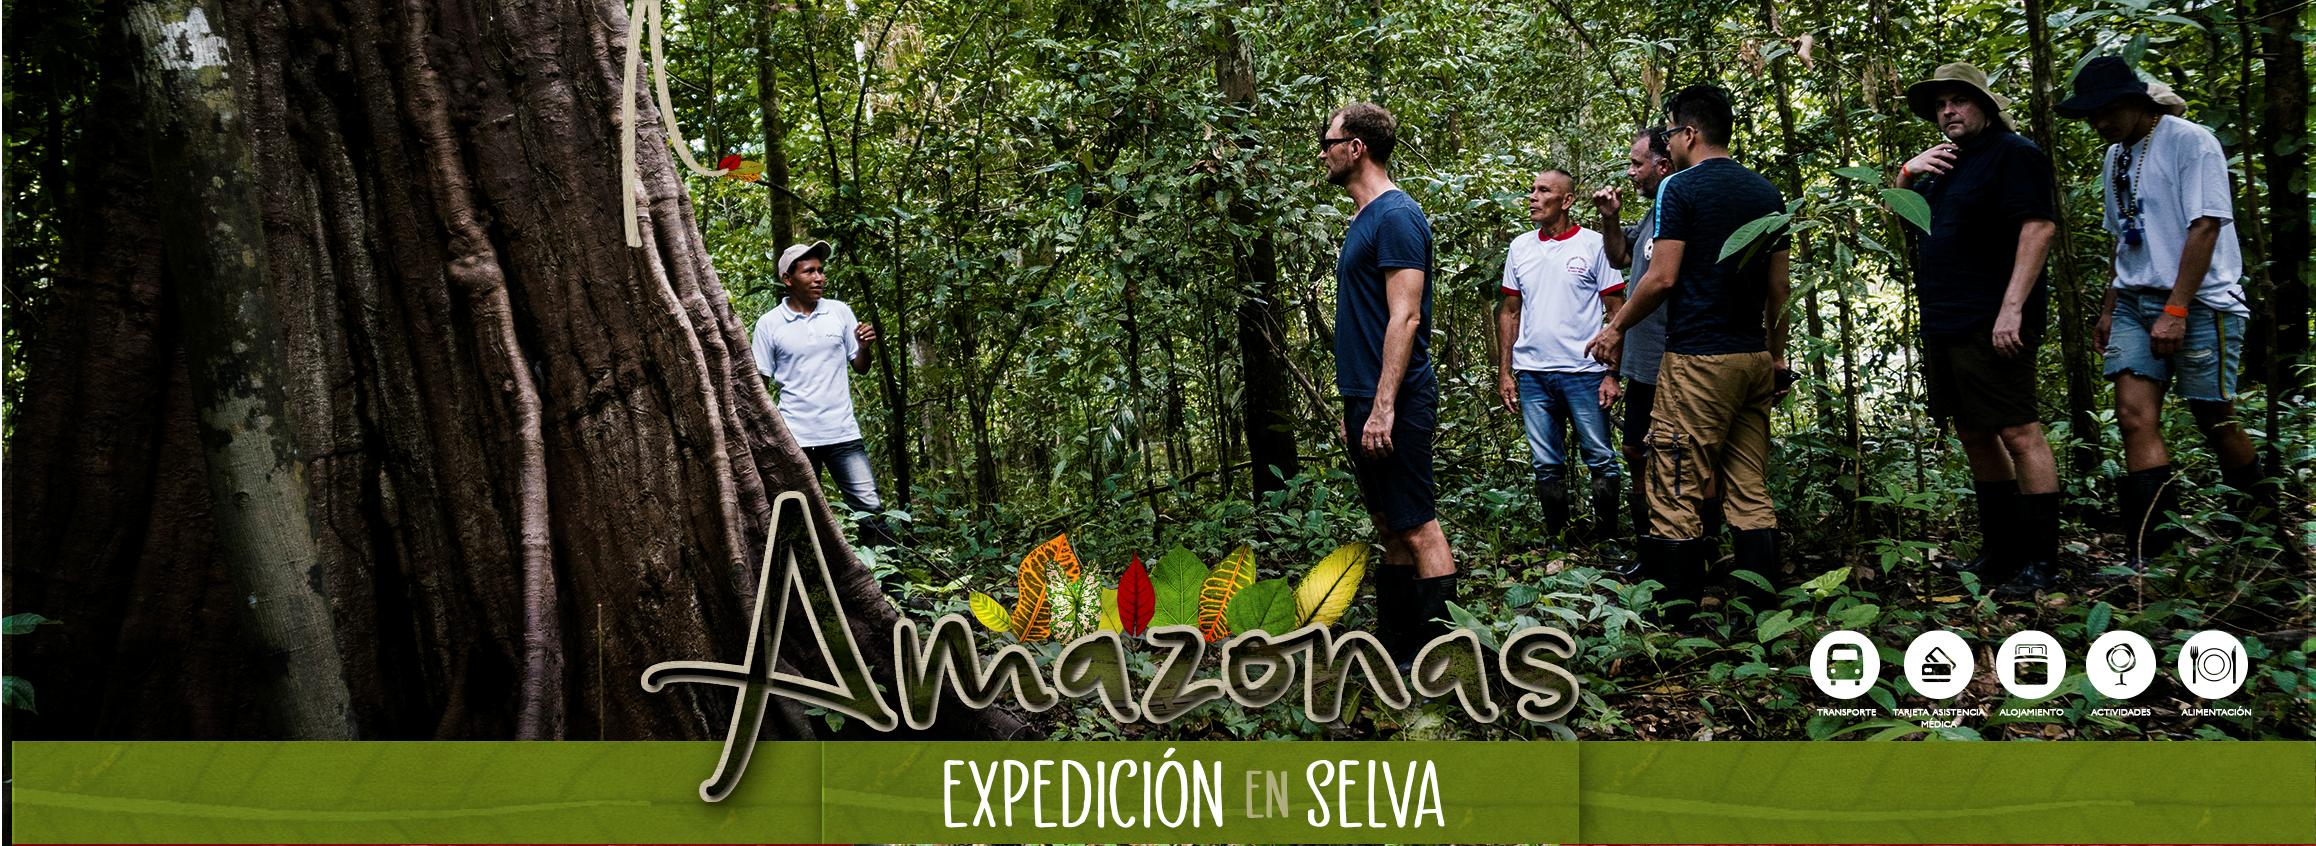 planes en selva amazonas